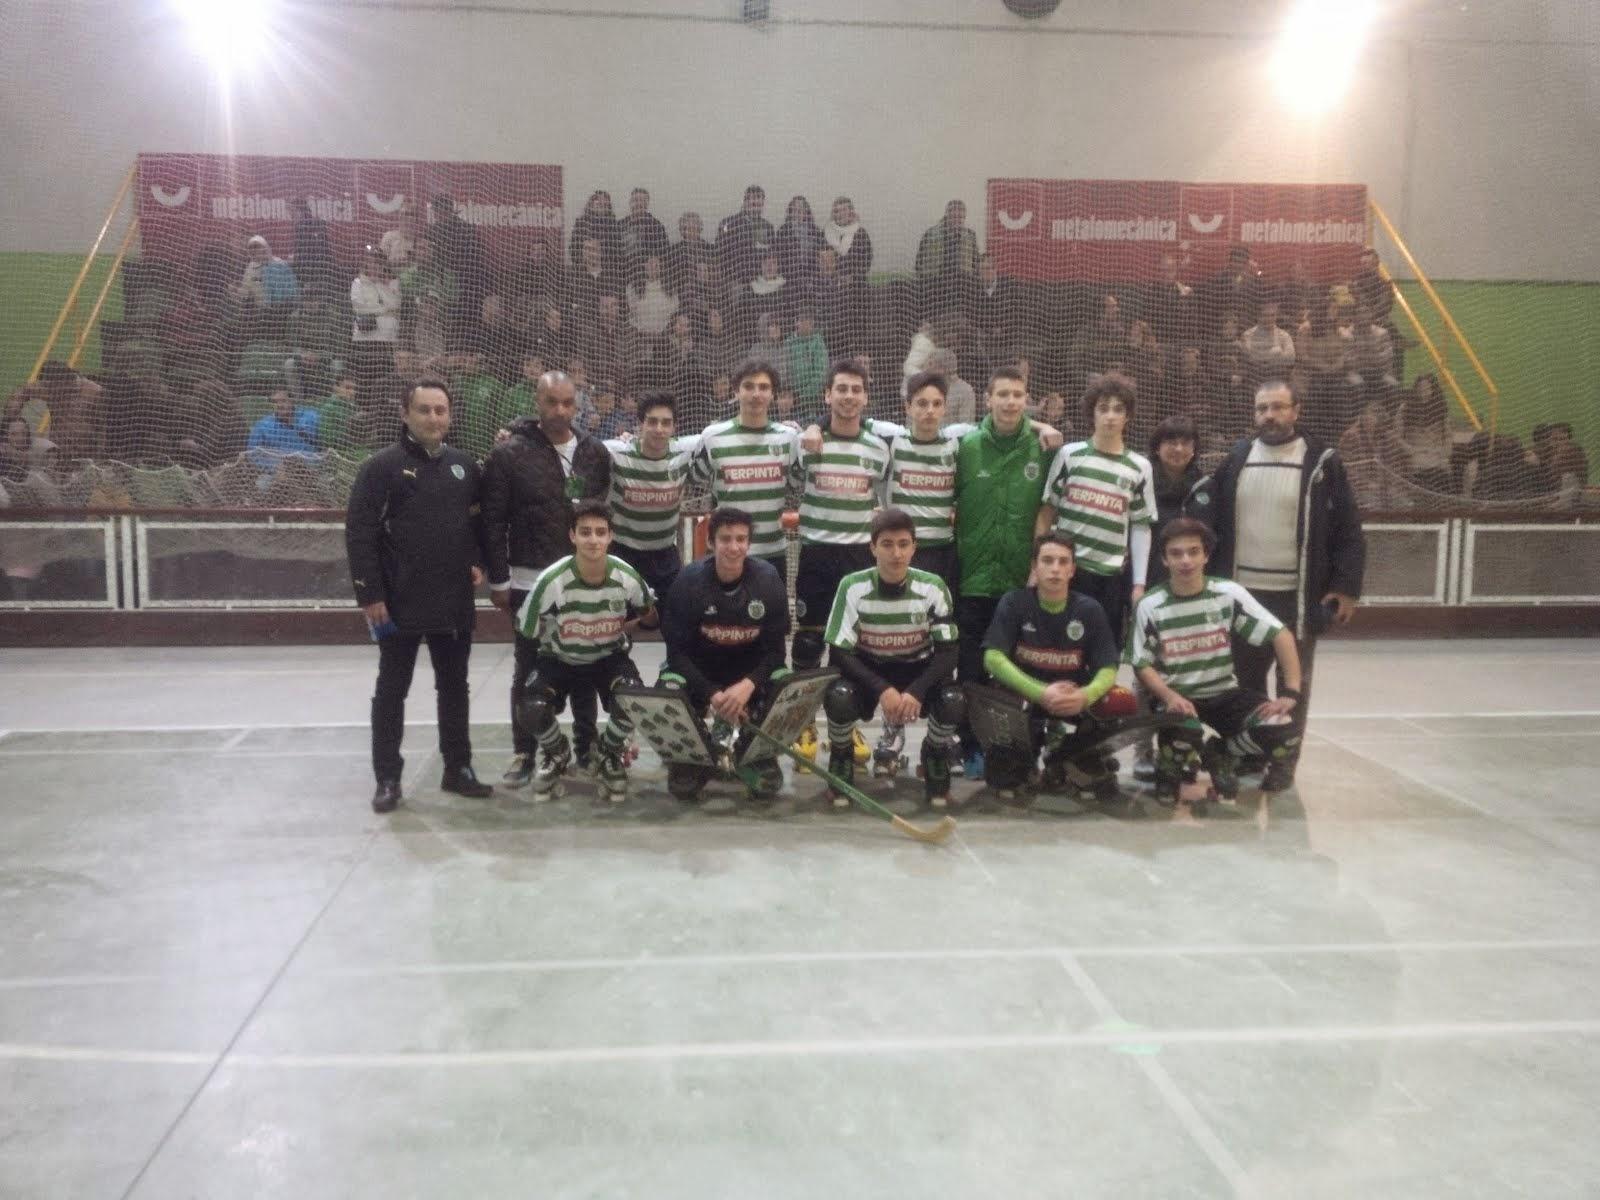 JUVENIS CAMPEÕES REGIONAIS 2014/15!